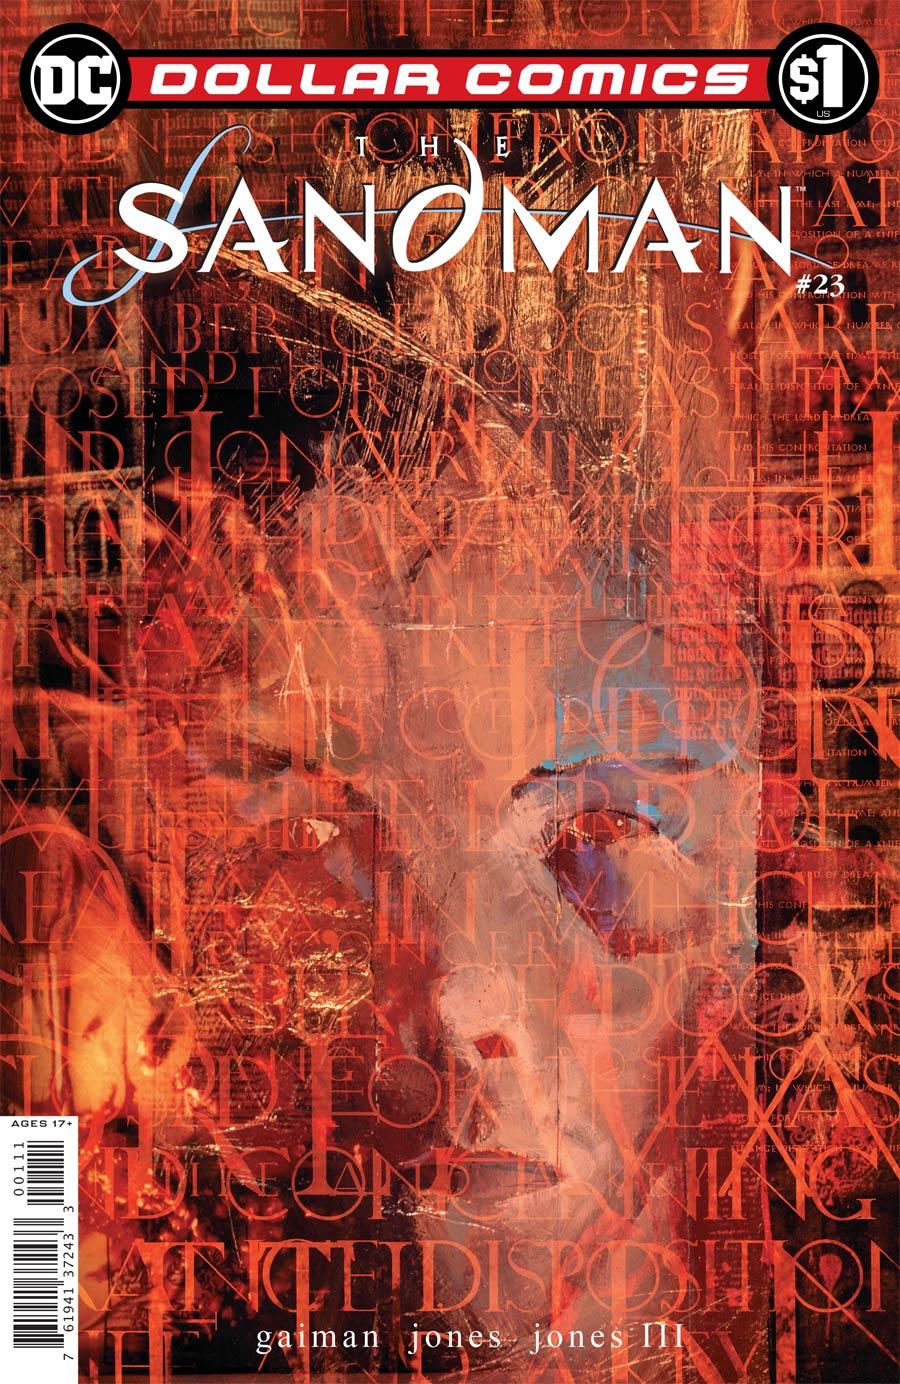 Dollar Comics: The Sandman #23 (2020)